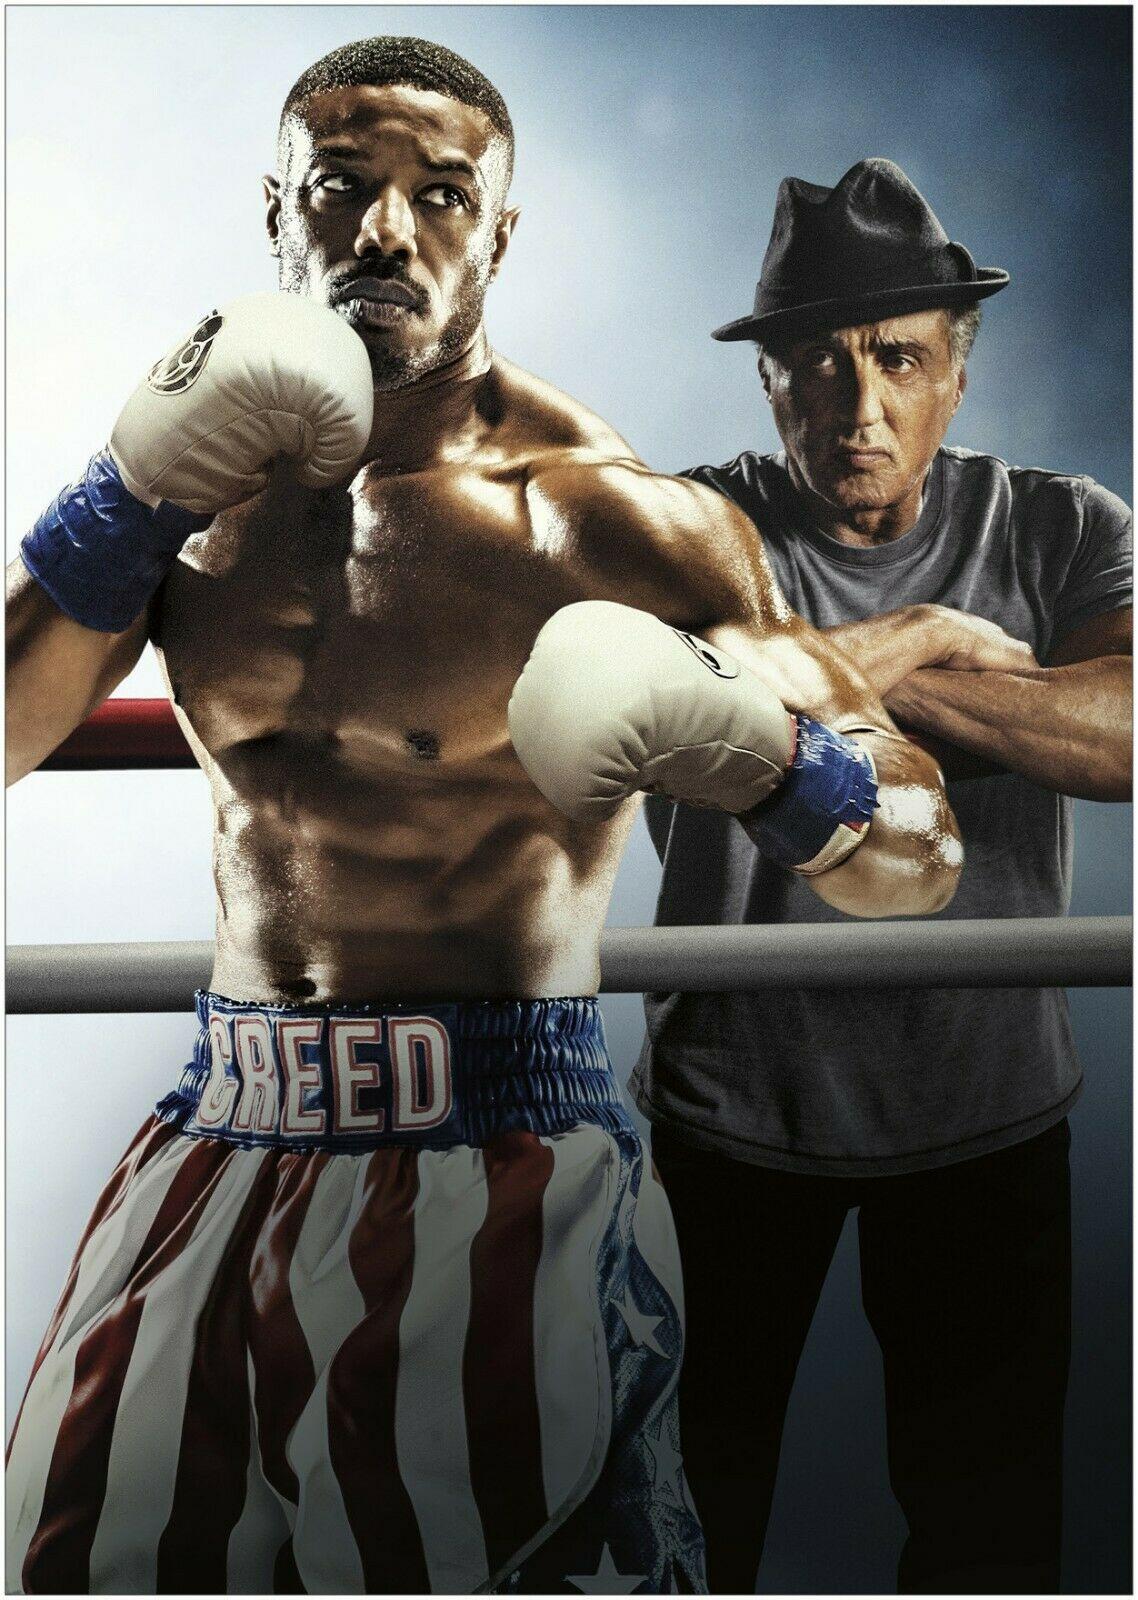 Rocky Balboa vs Apollo Creed Knockout Punch Art Silk Poster 12x18 24x36